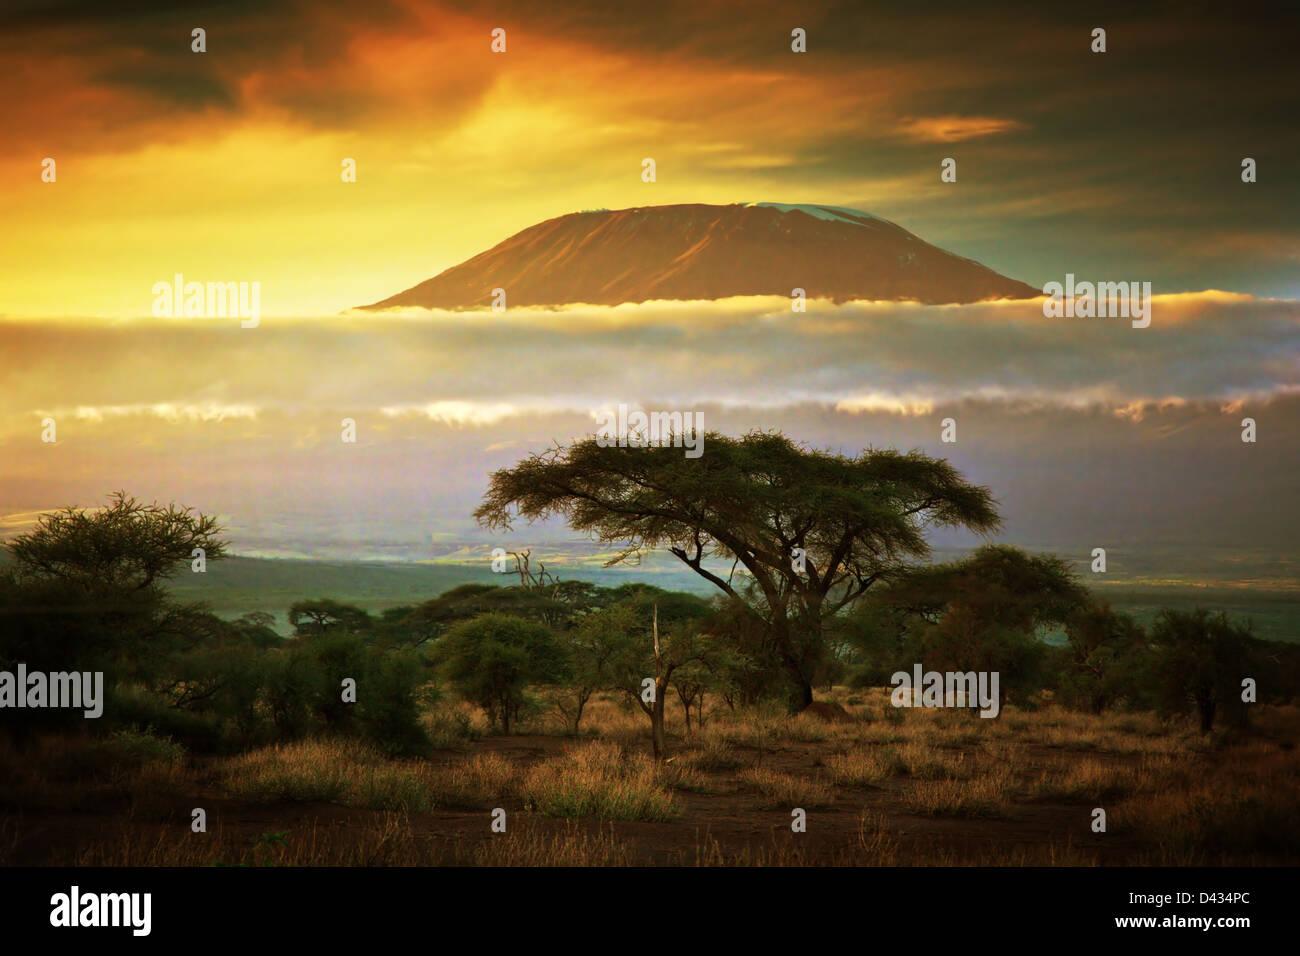 Kilimanjaro, Amboseli, Kenya, Africa. Imagen De Stock